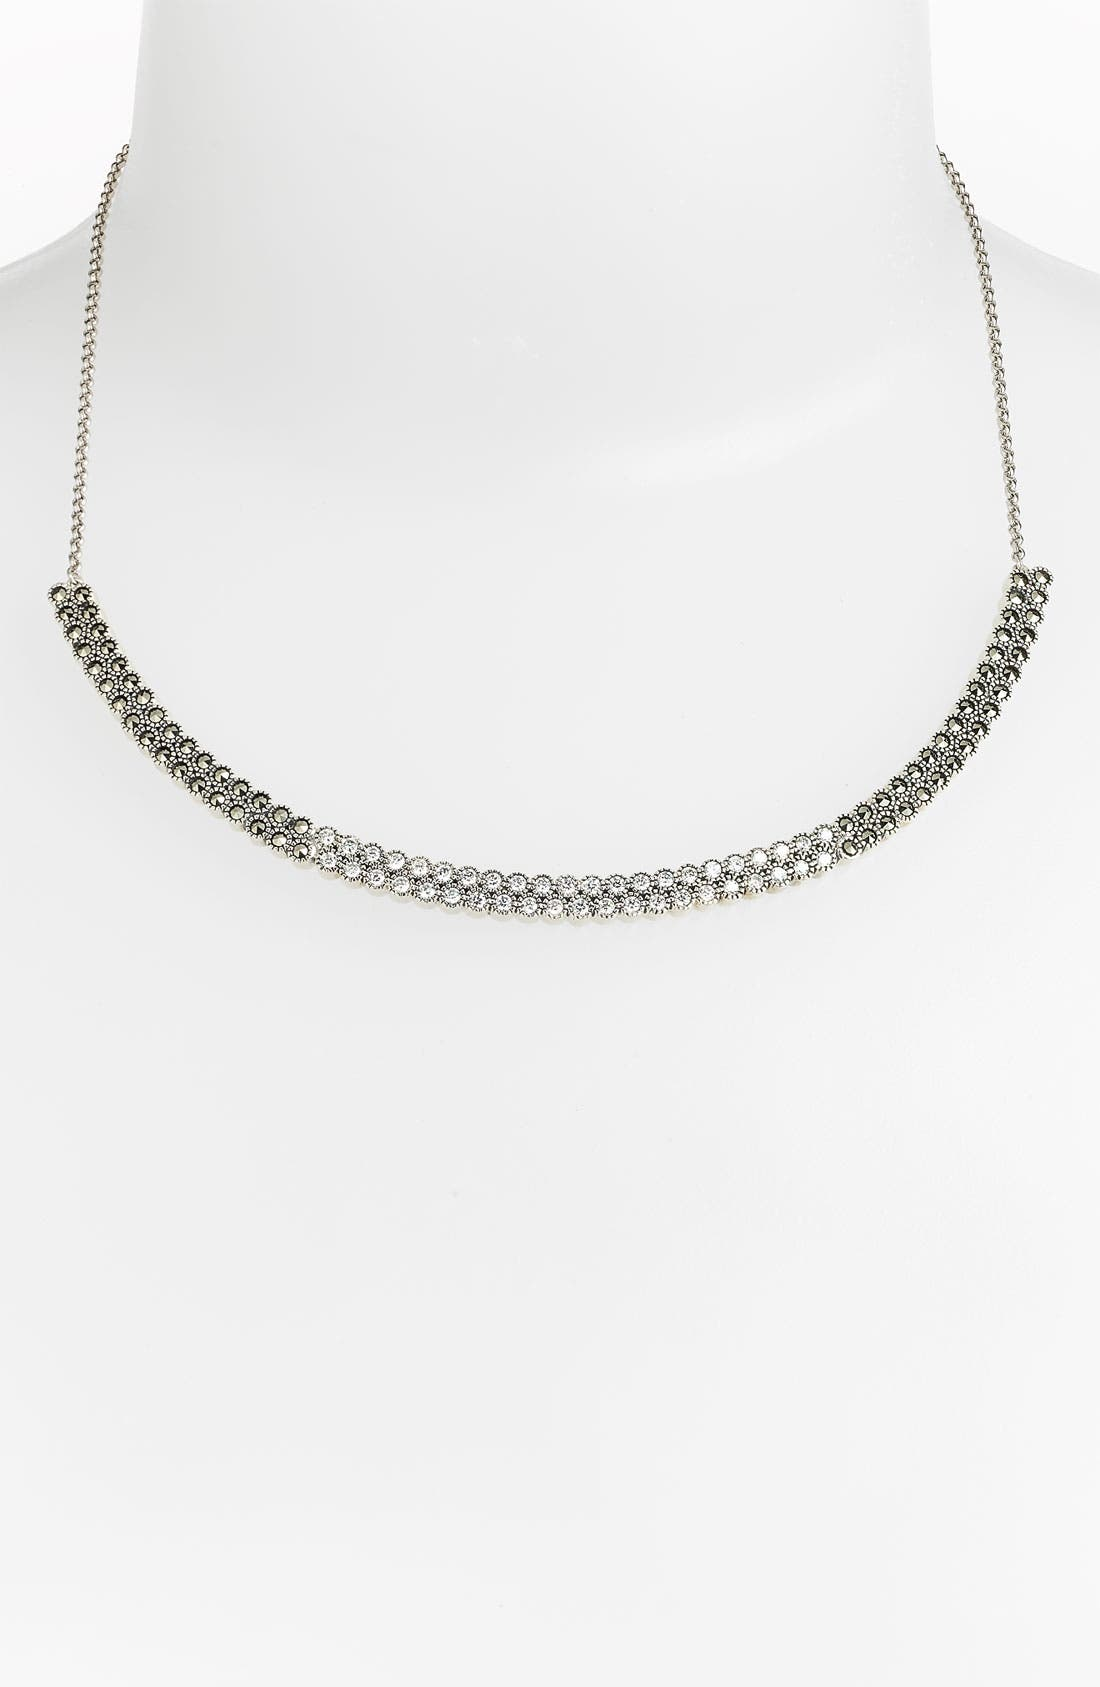 Alternate Image 1 Selected - Judith Jack 'Starlight' Collar Necklace